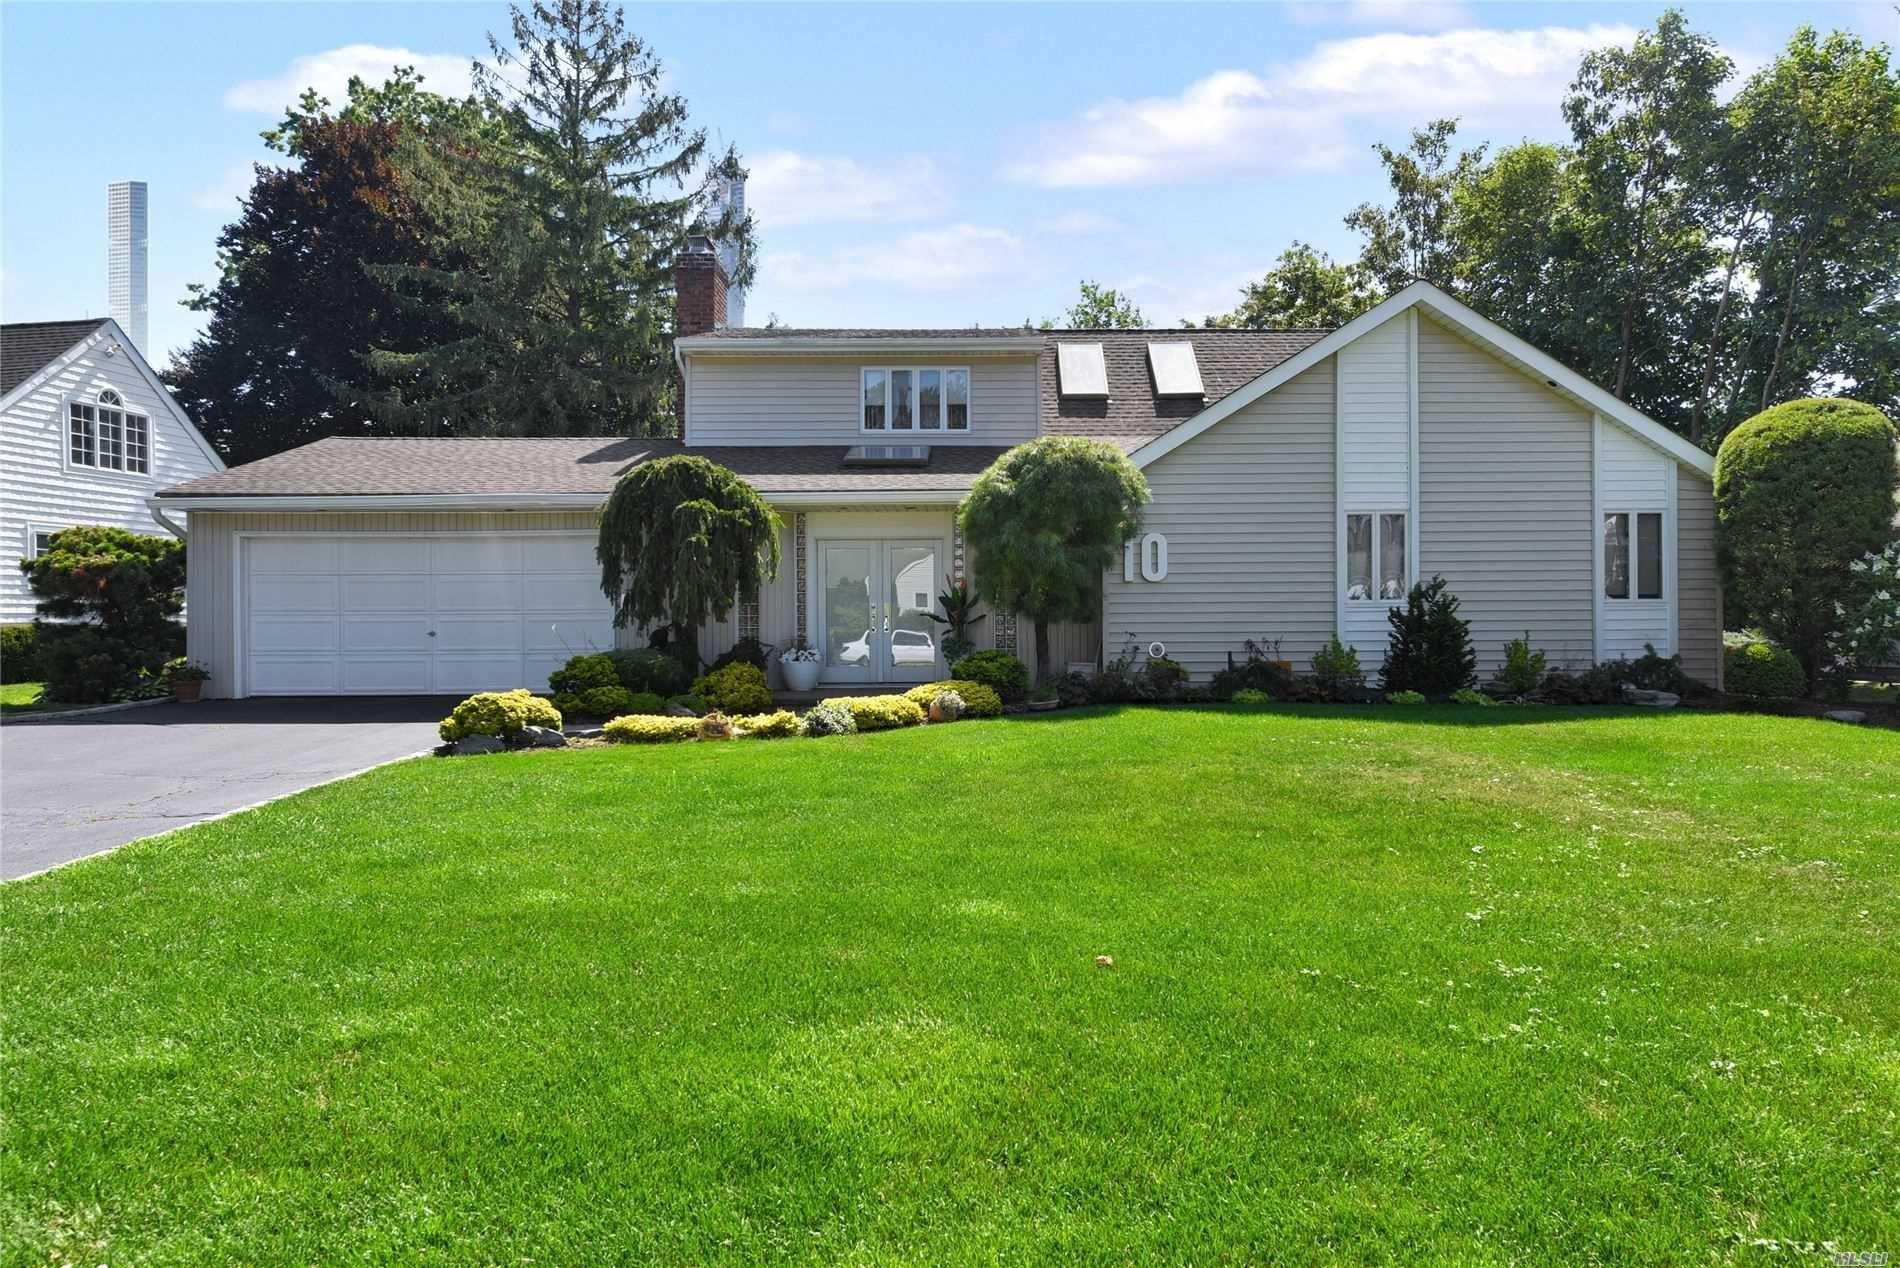 10 Bluebird Drive, East Hills, NY 11577 - MLS#: 3239948